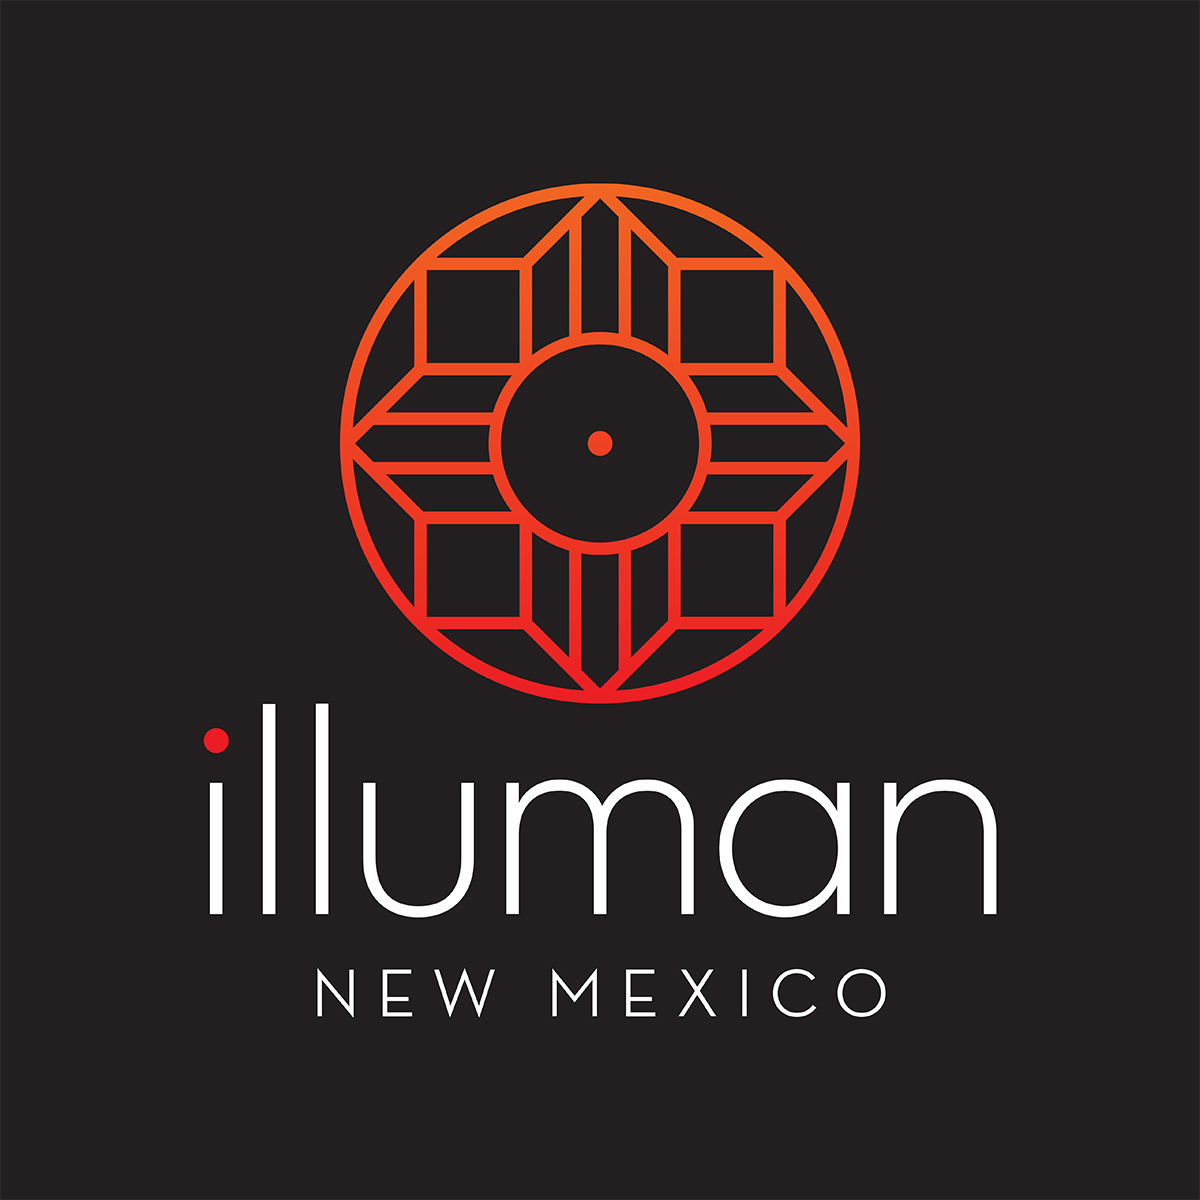 Illuman New Mexico